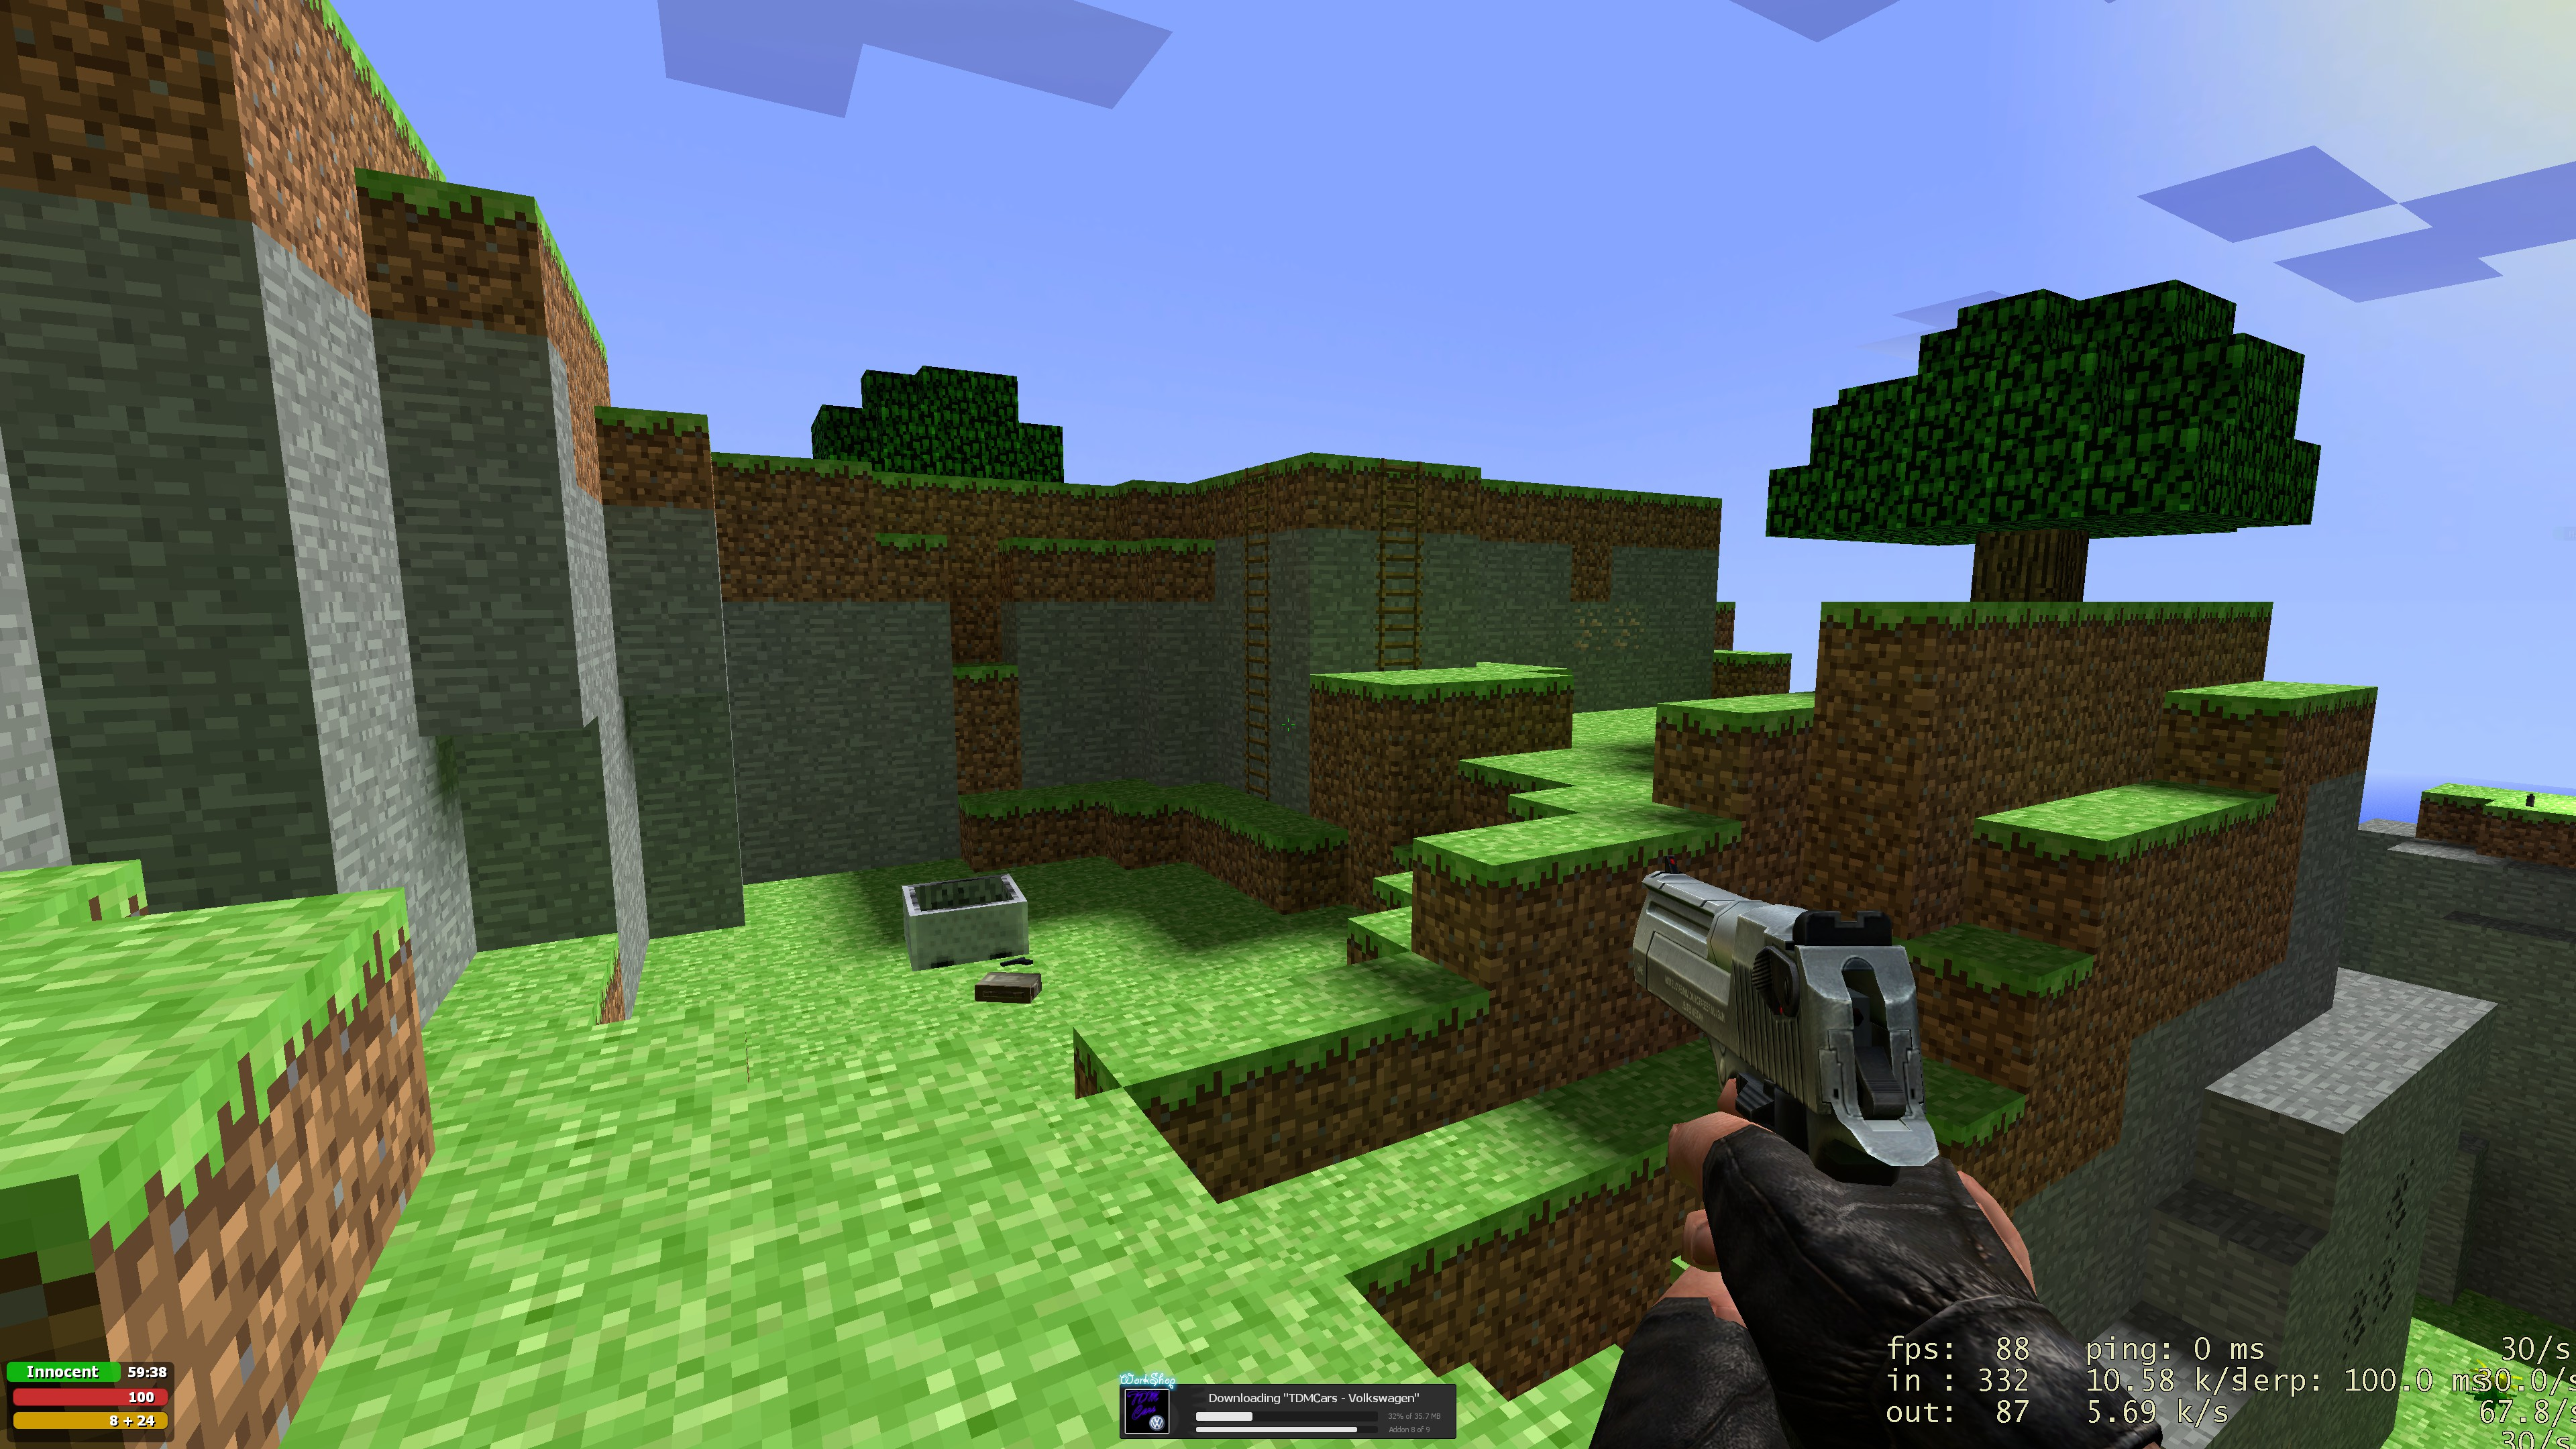 Steam Community Guide Secrets In Some TTT Minecraft Maps - Minecart minecraft teleport to player